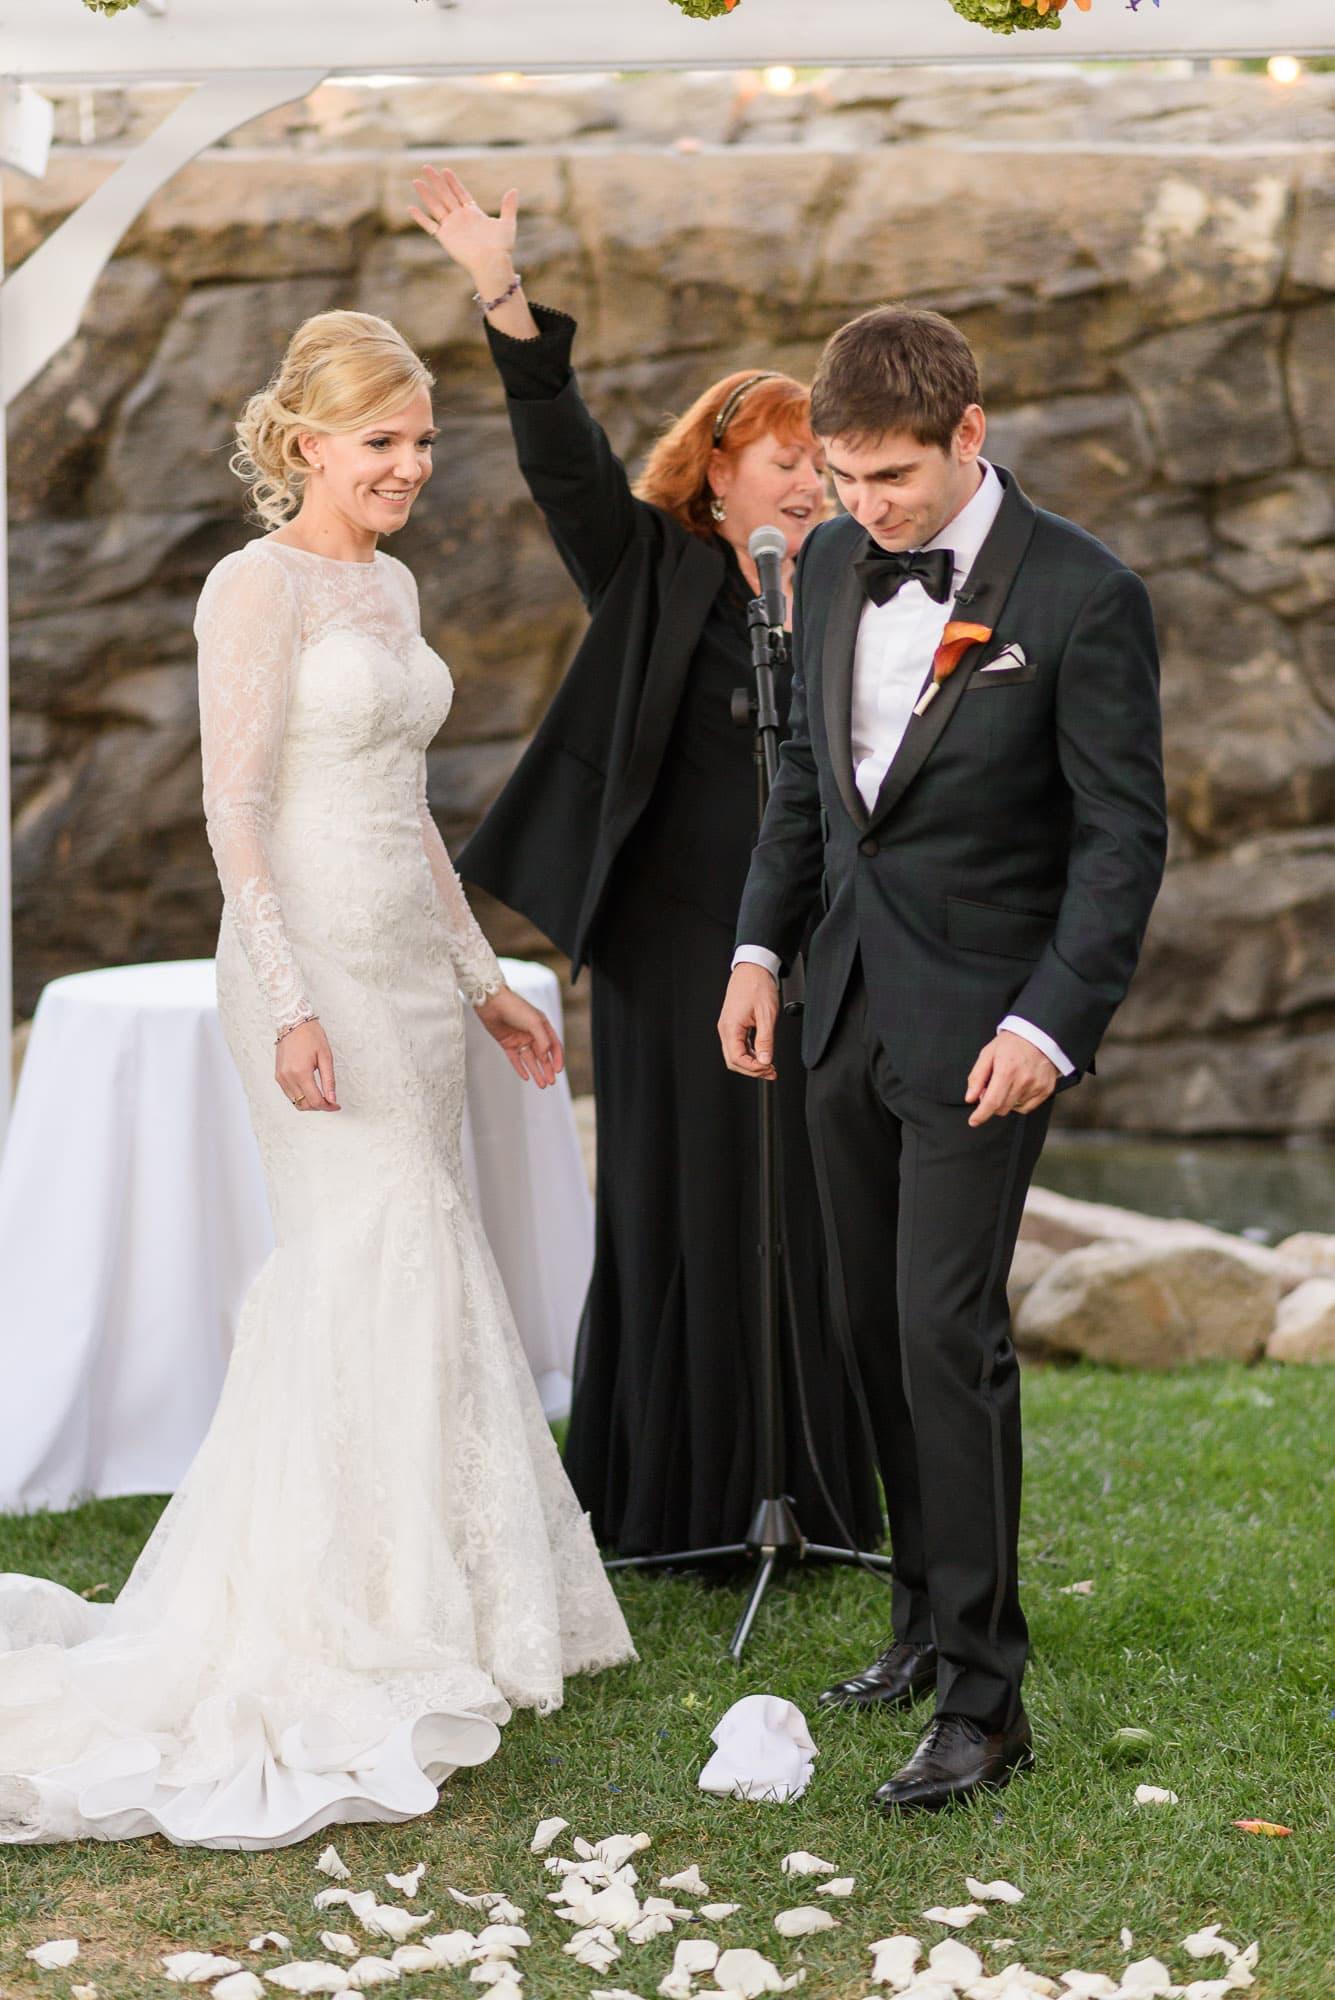 056_Alan_and_Heidi_Los_Angeles_Equestrian_Center_Wedding